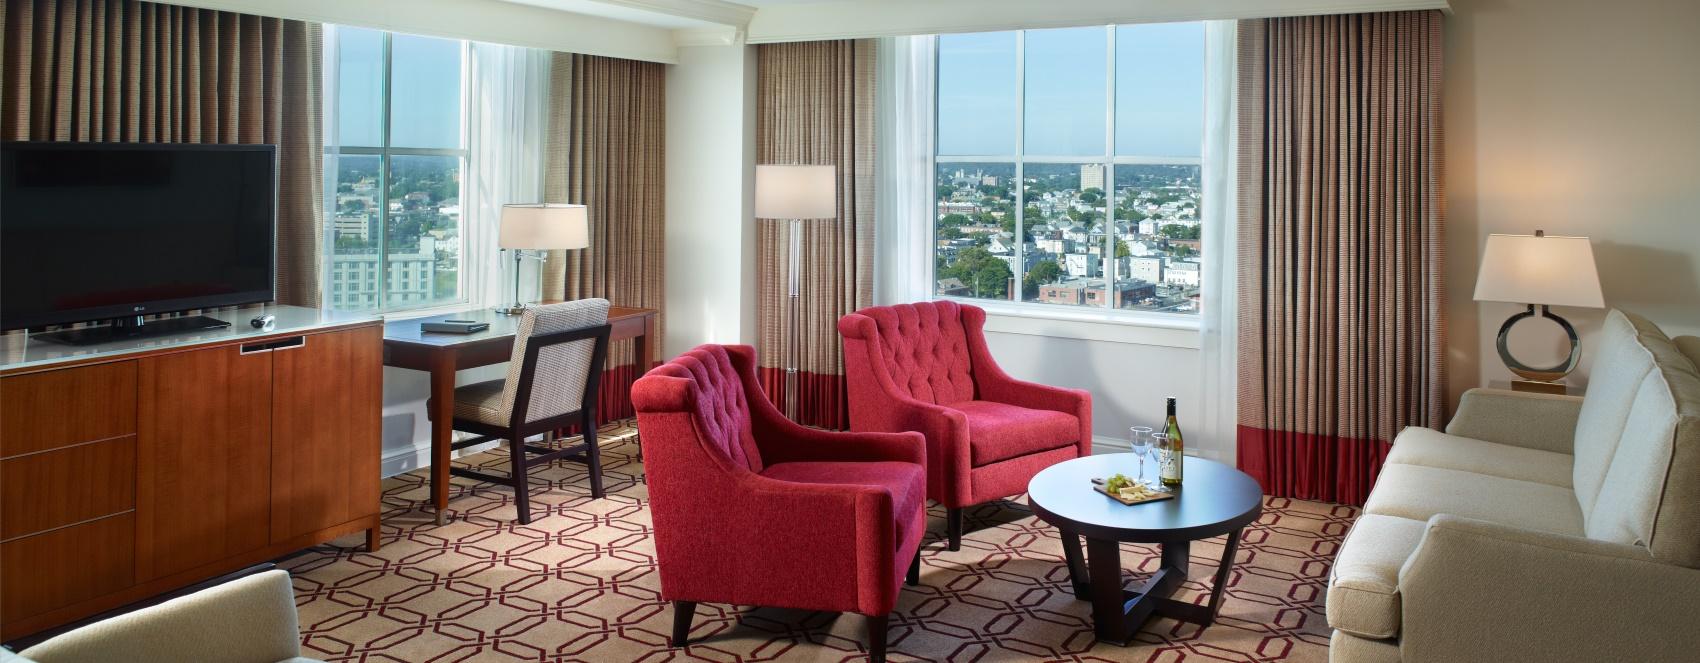 Providence Hotels | Omni Providence Hotel